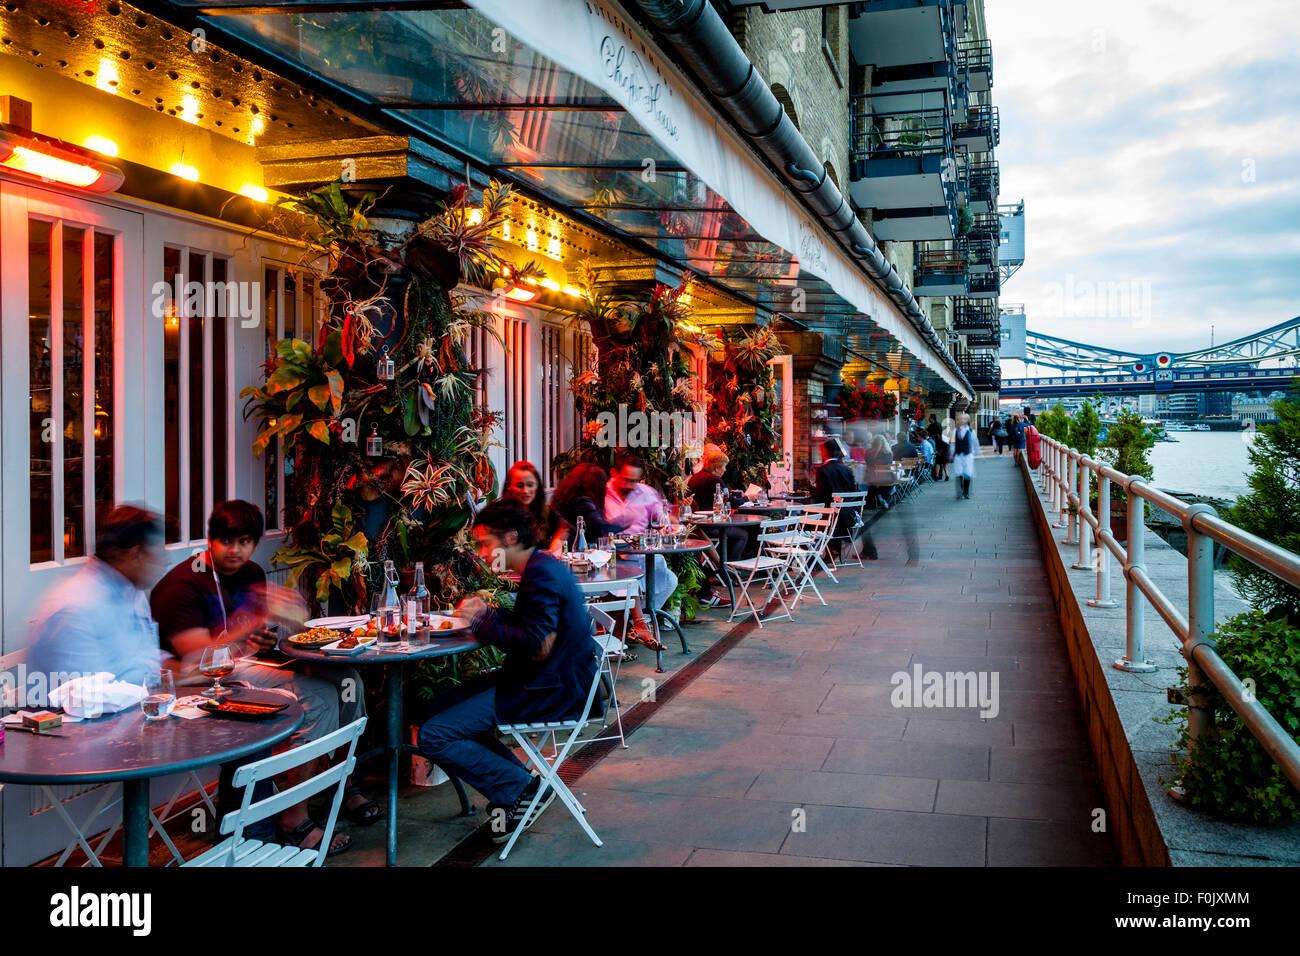 Butlers Wharf Gastrodrome - LondonTown.com